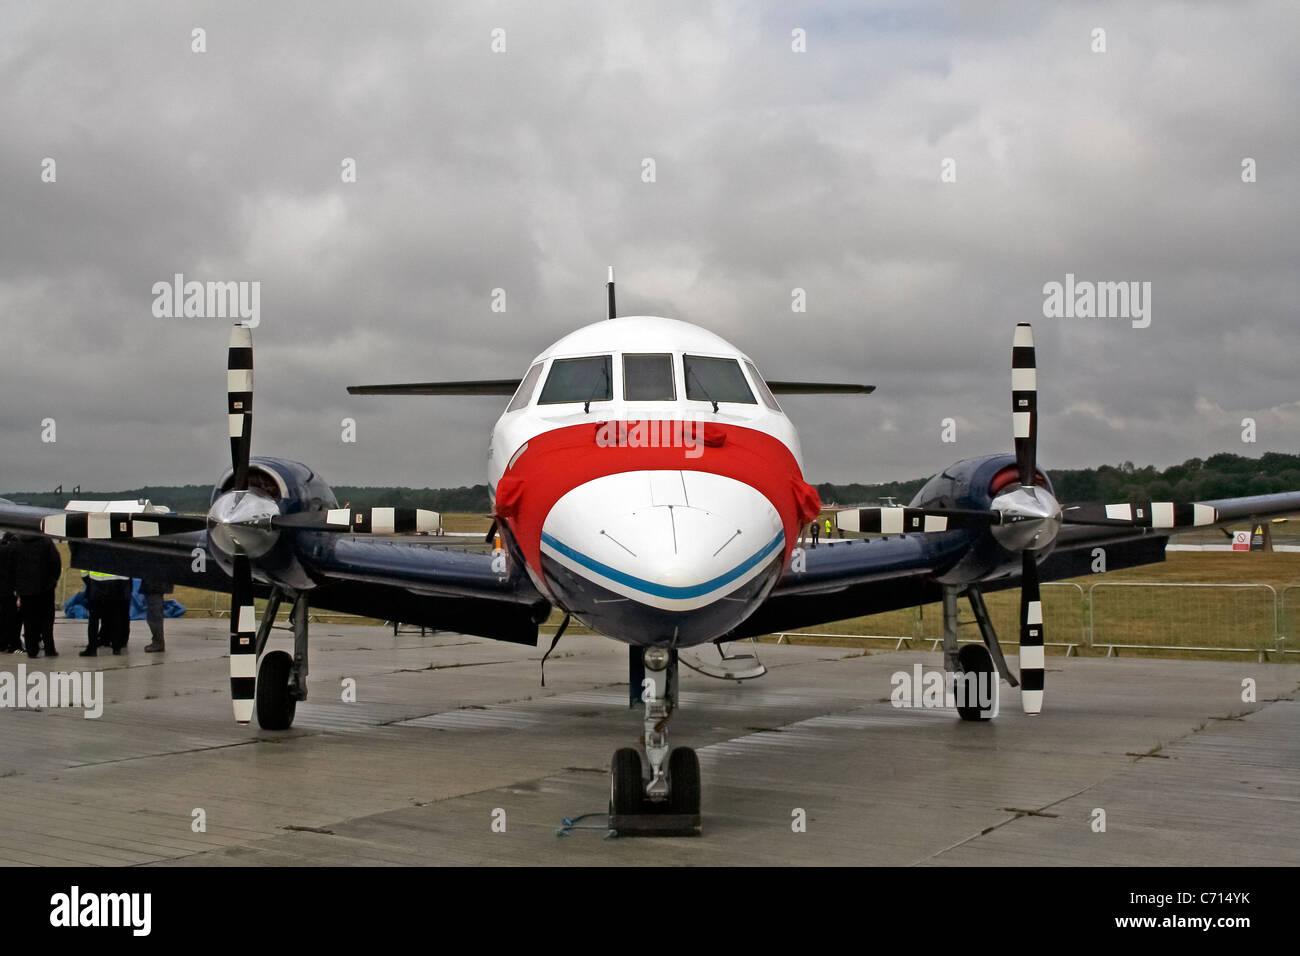 British Aerospace BAe Jetstream 31 G-NFLA Cranfield University at the Farnborough International Airshow - Stock Image